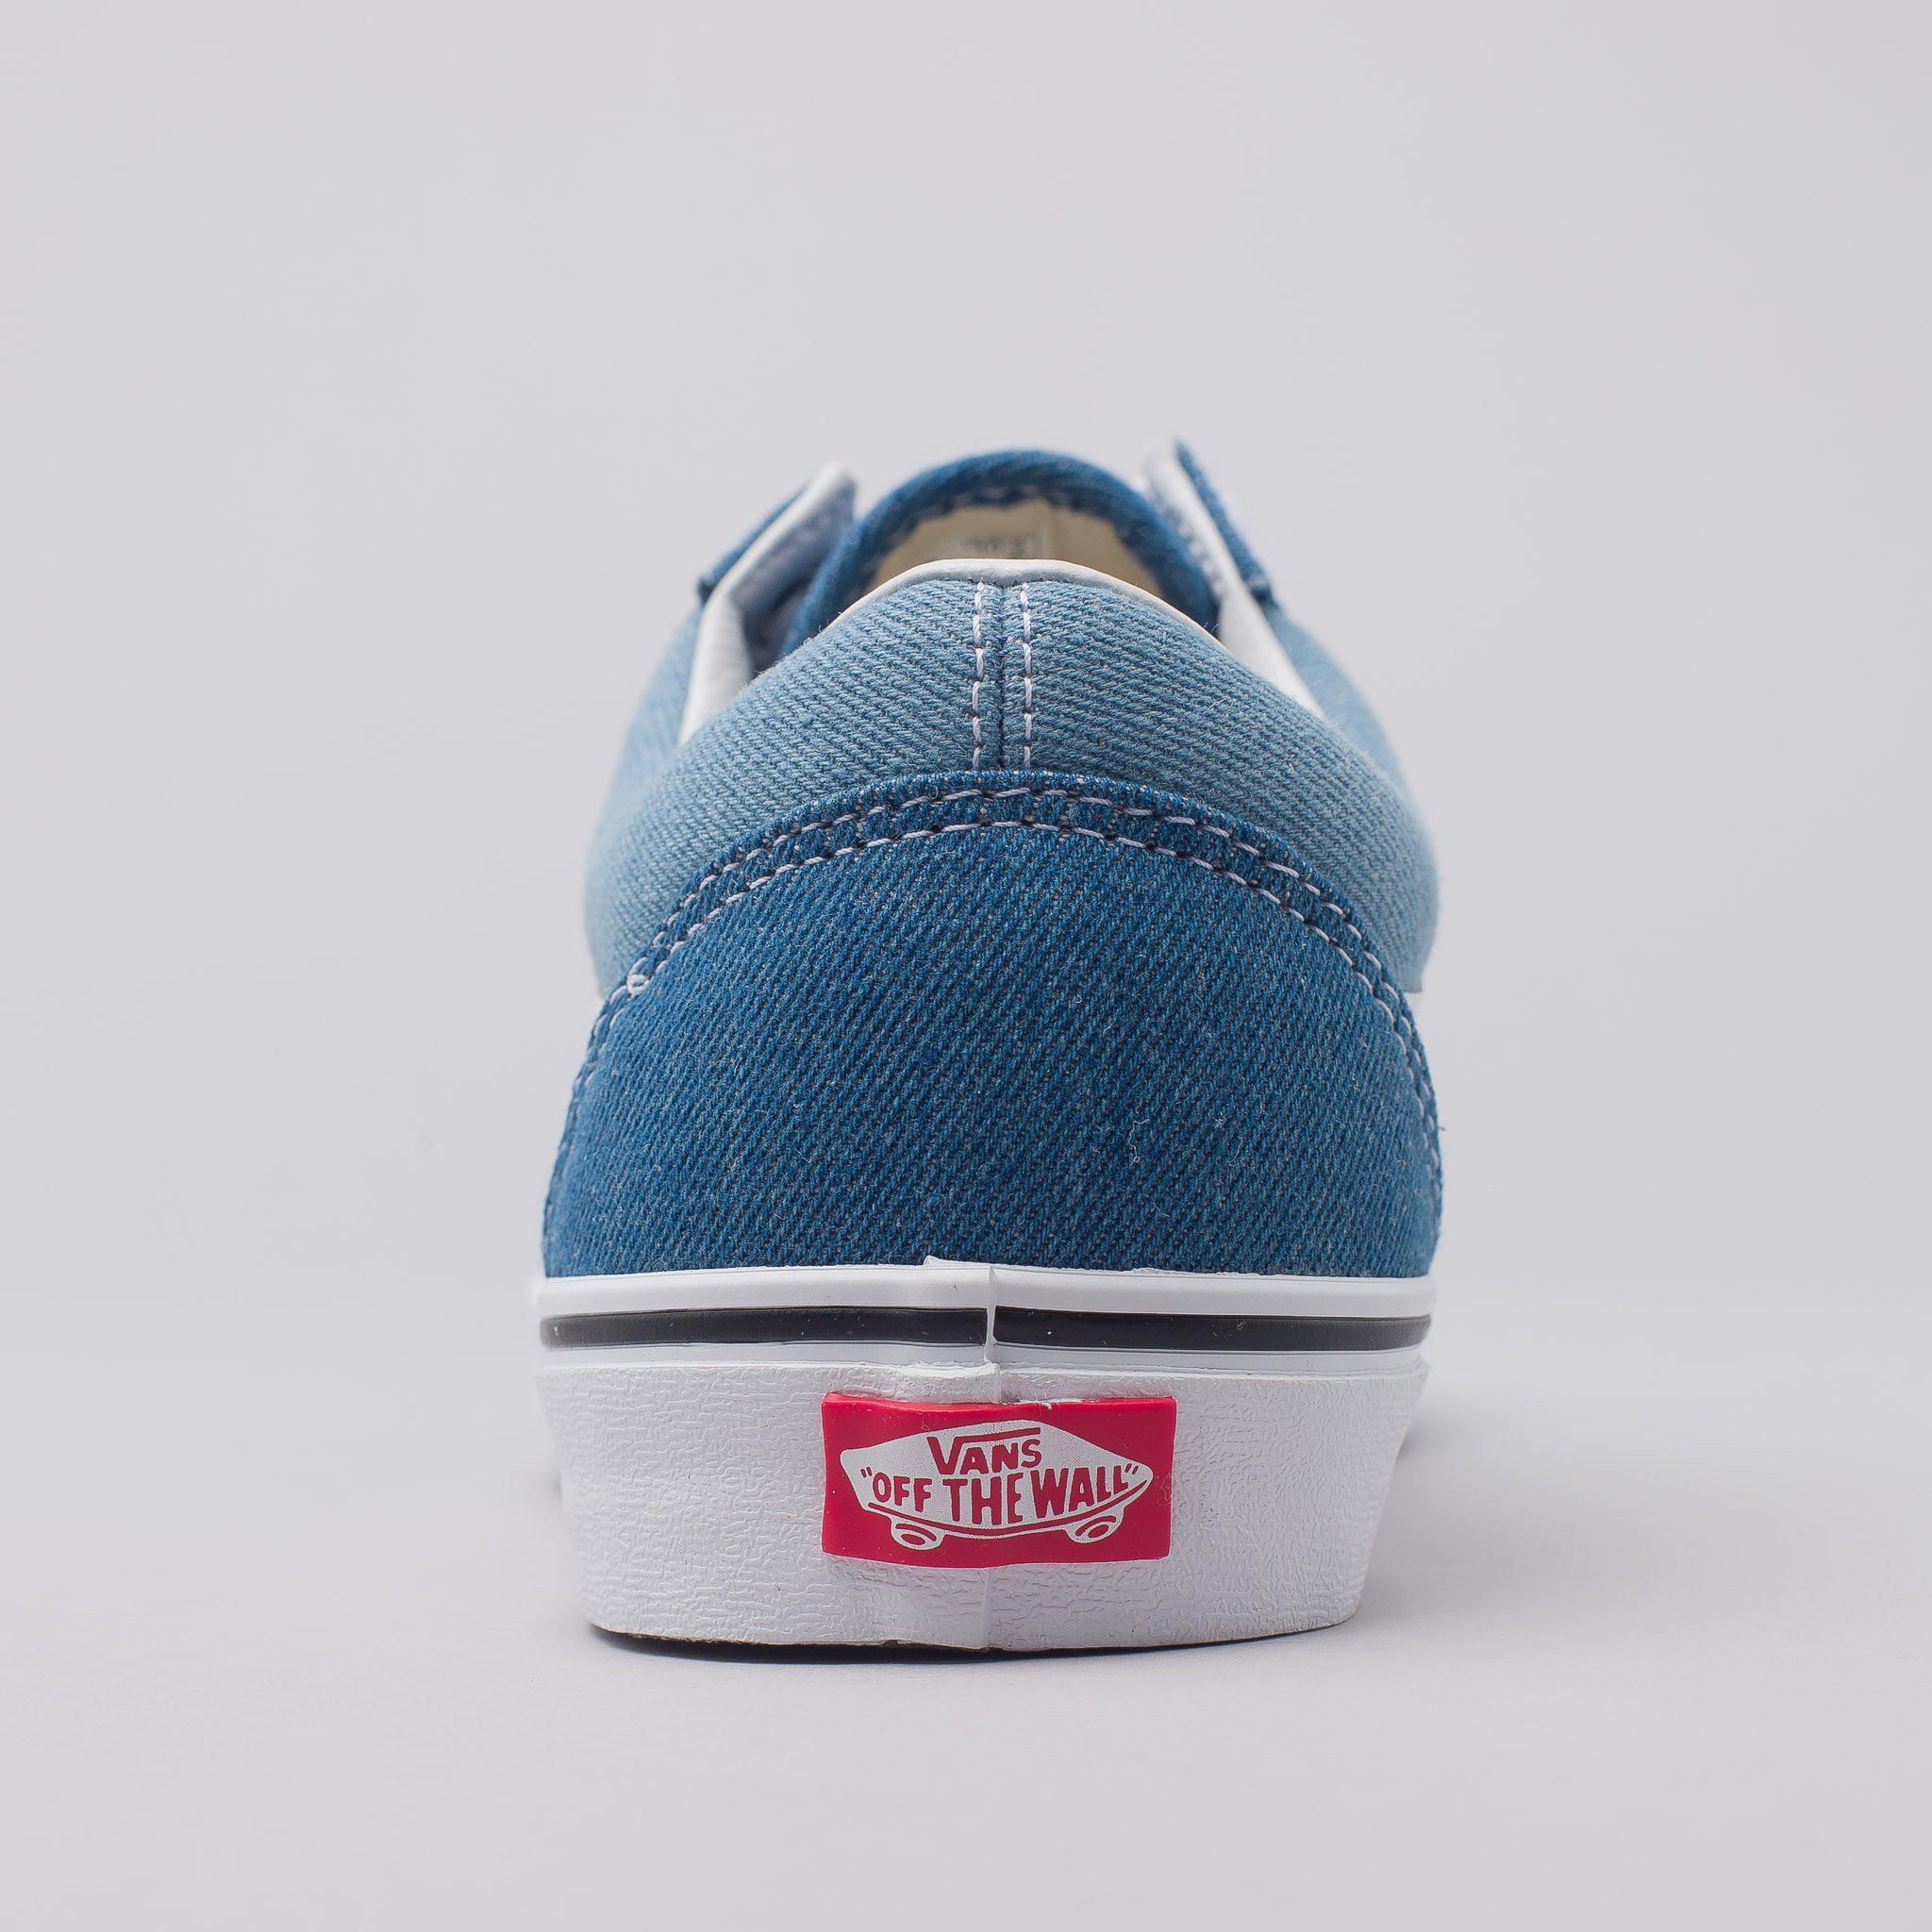 005fa64765 Lyst - Vans Old Skool Denim 2-tone In Blue in Blue for Men